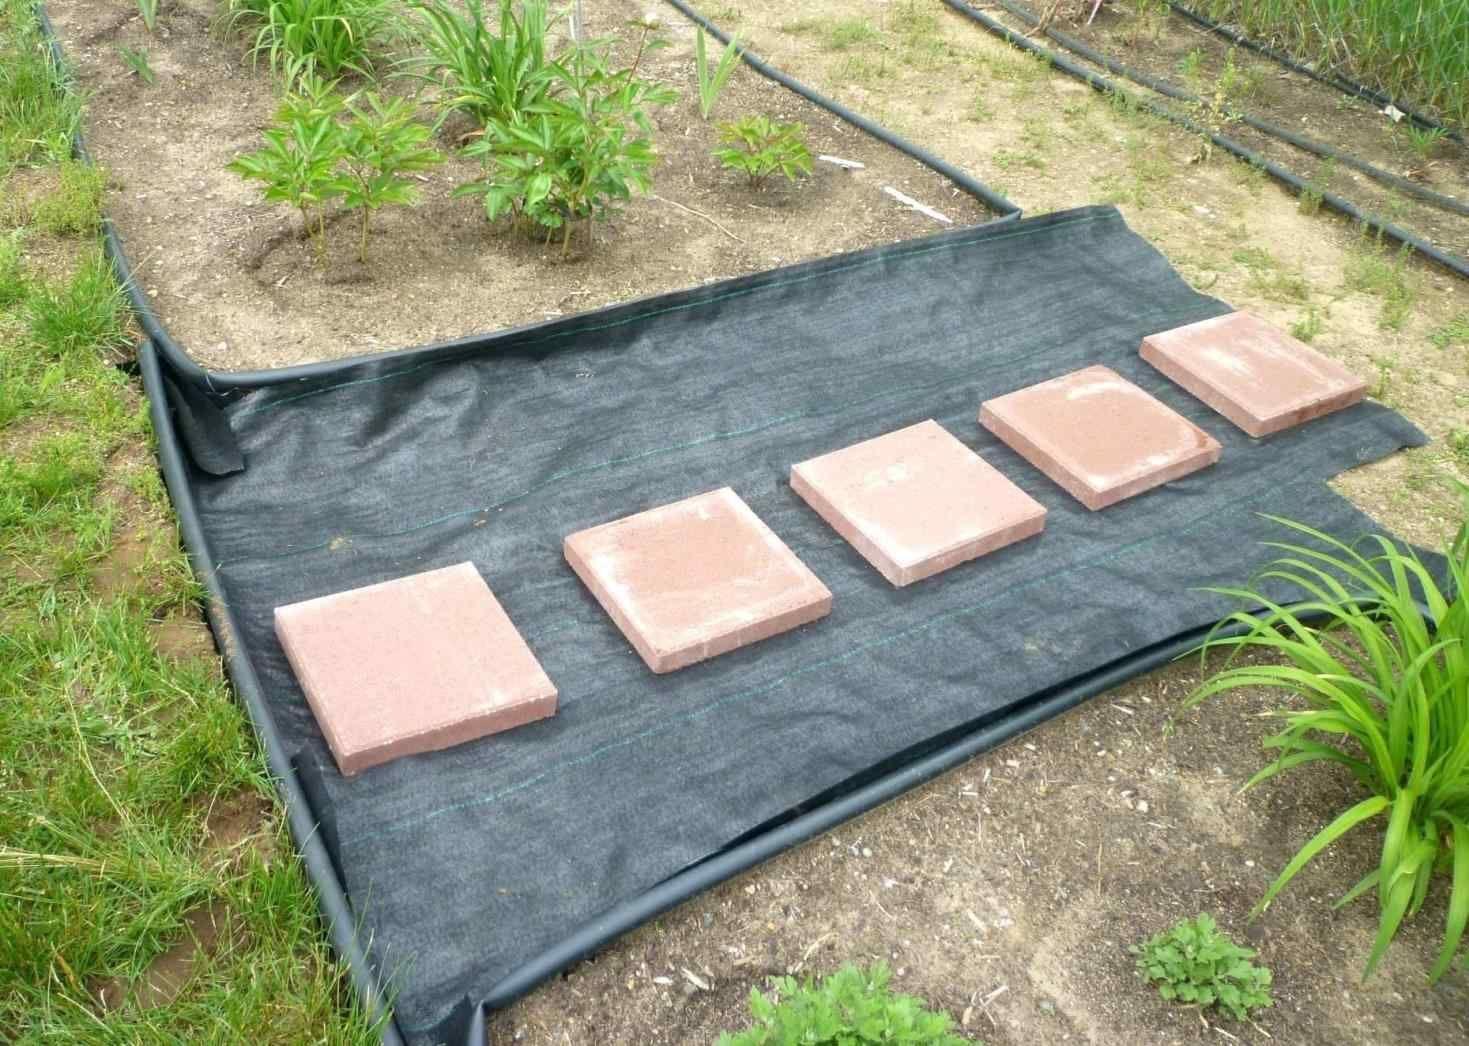 20 Gorgeous Stone Stepping Stones Ideas For Garden Paths Garden Stepping Stones Garden Paths Garden Stones